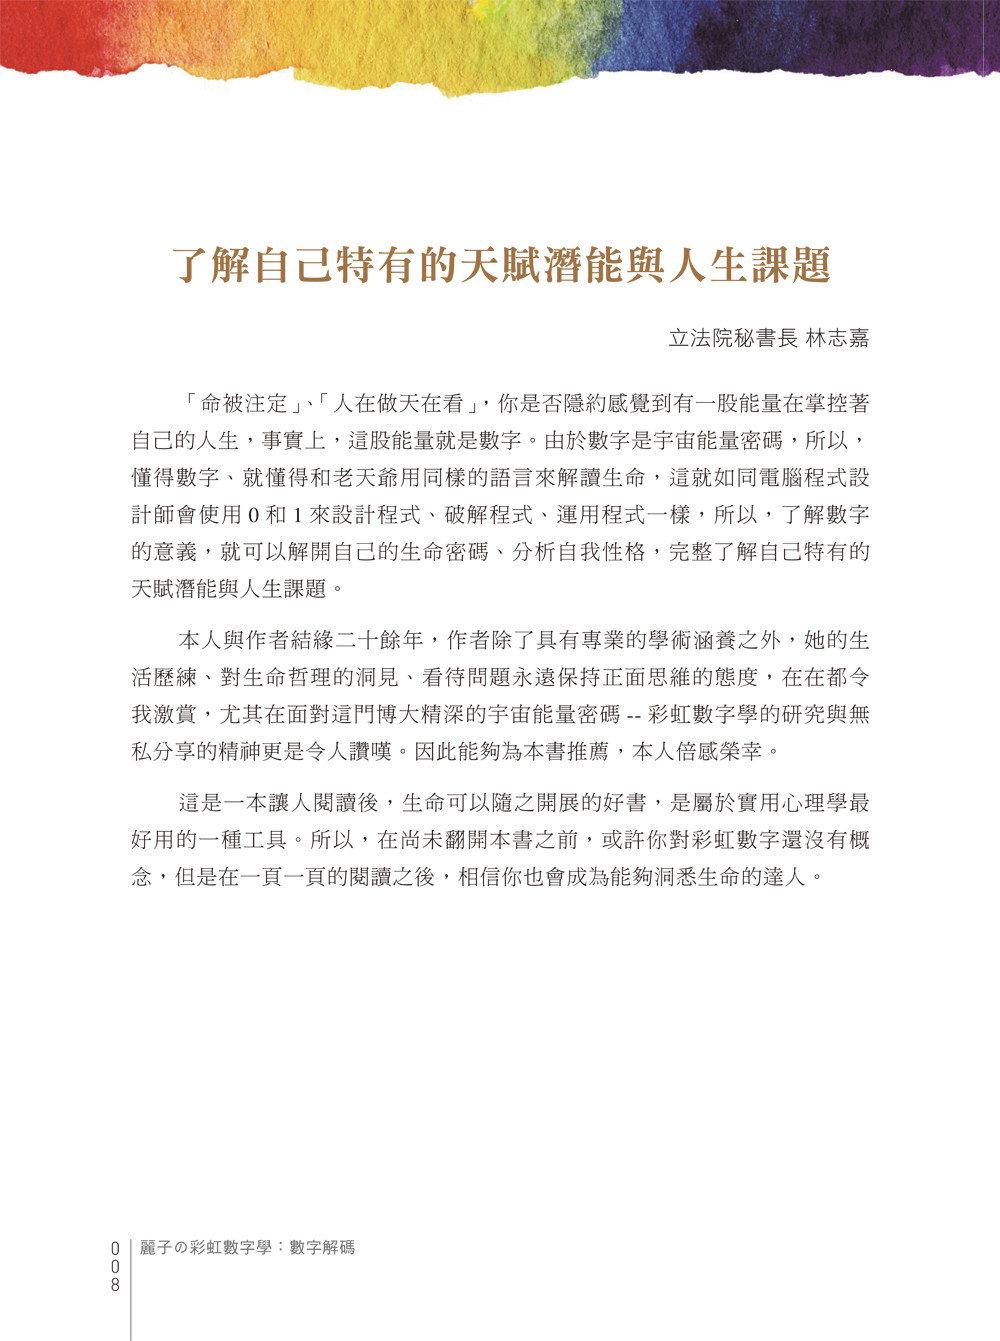 麗子の彩虹數字學:數字解碼與理論基礎-preview-8